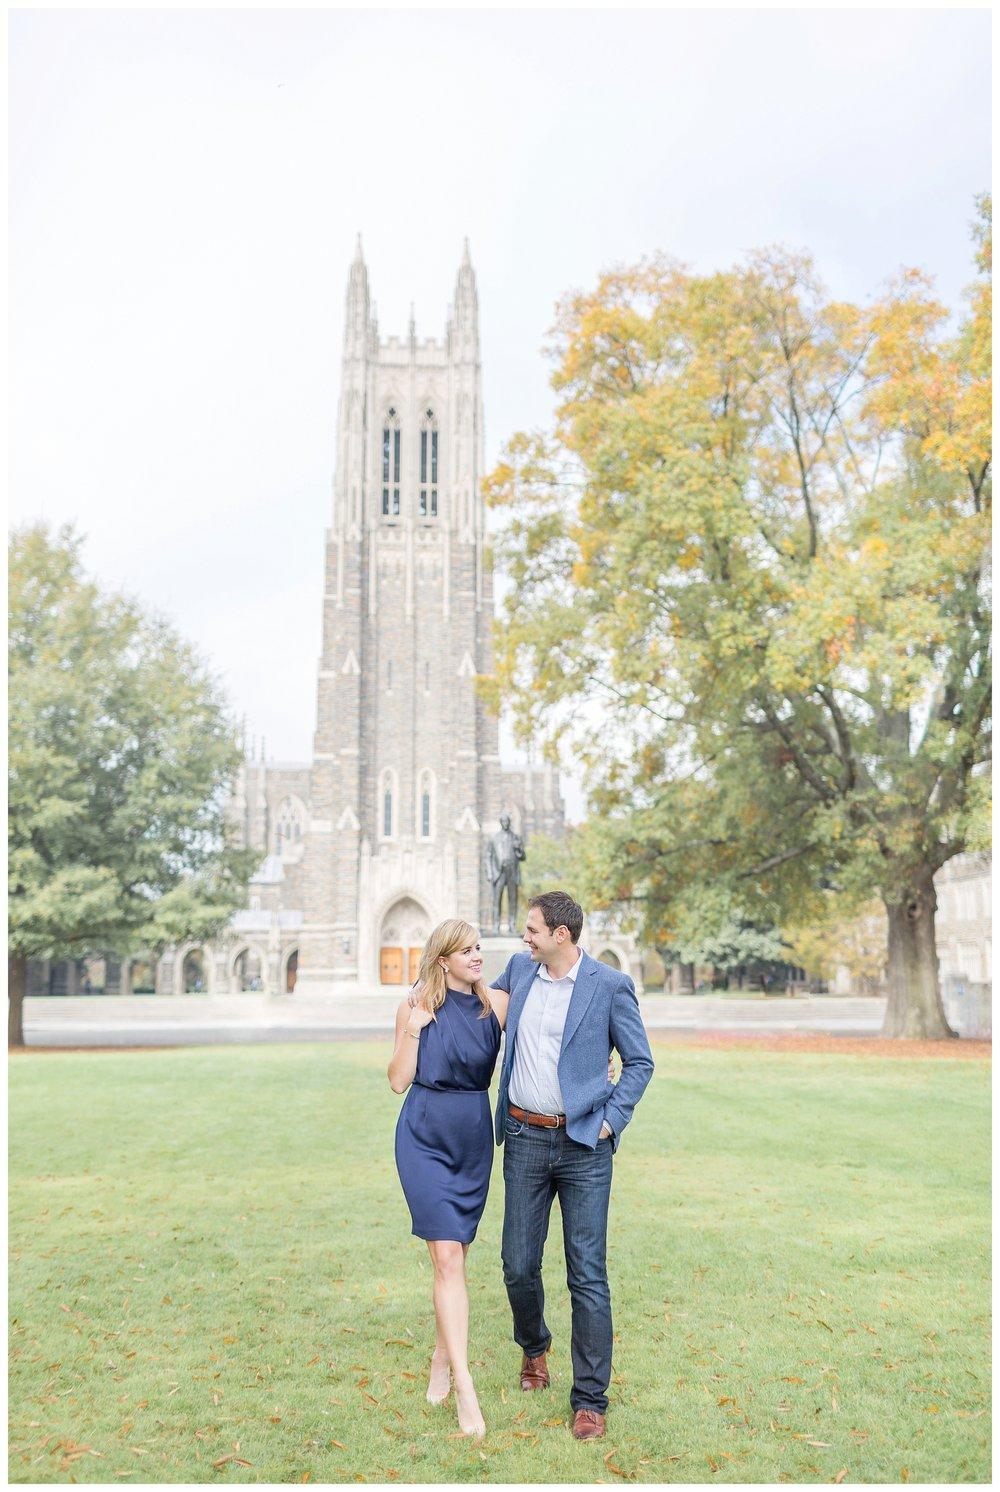 duke-university-engagement-durham-wedding-photographer_0015.jpg